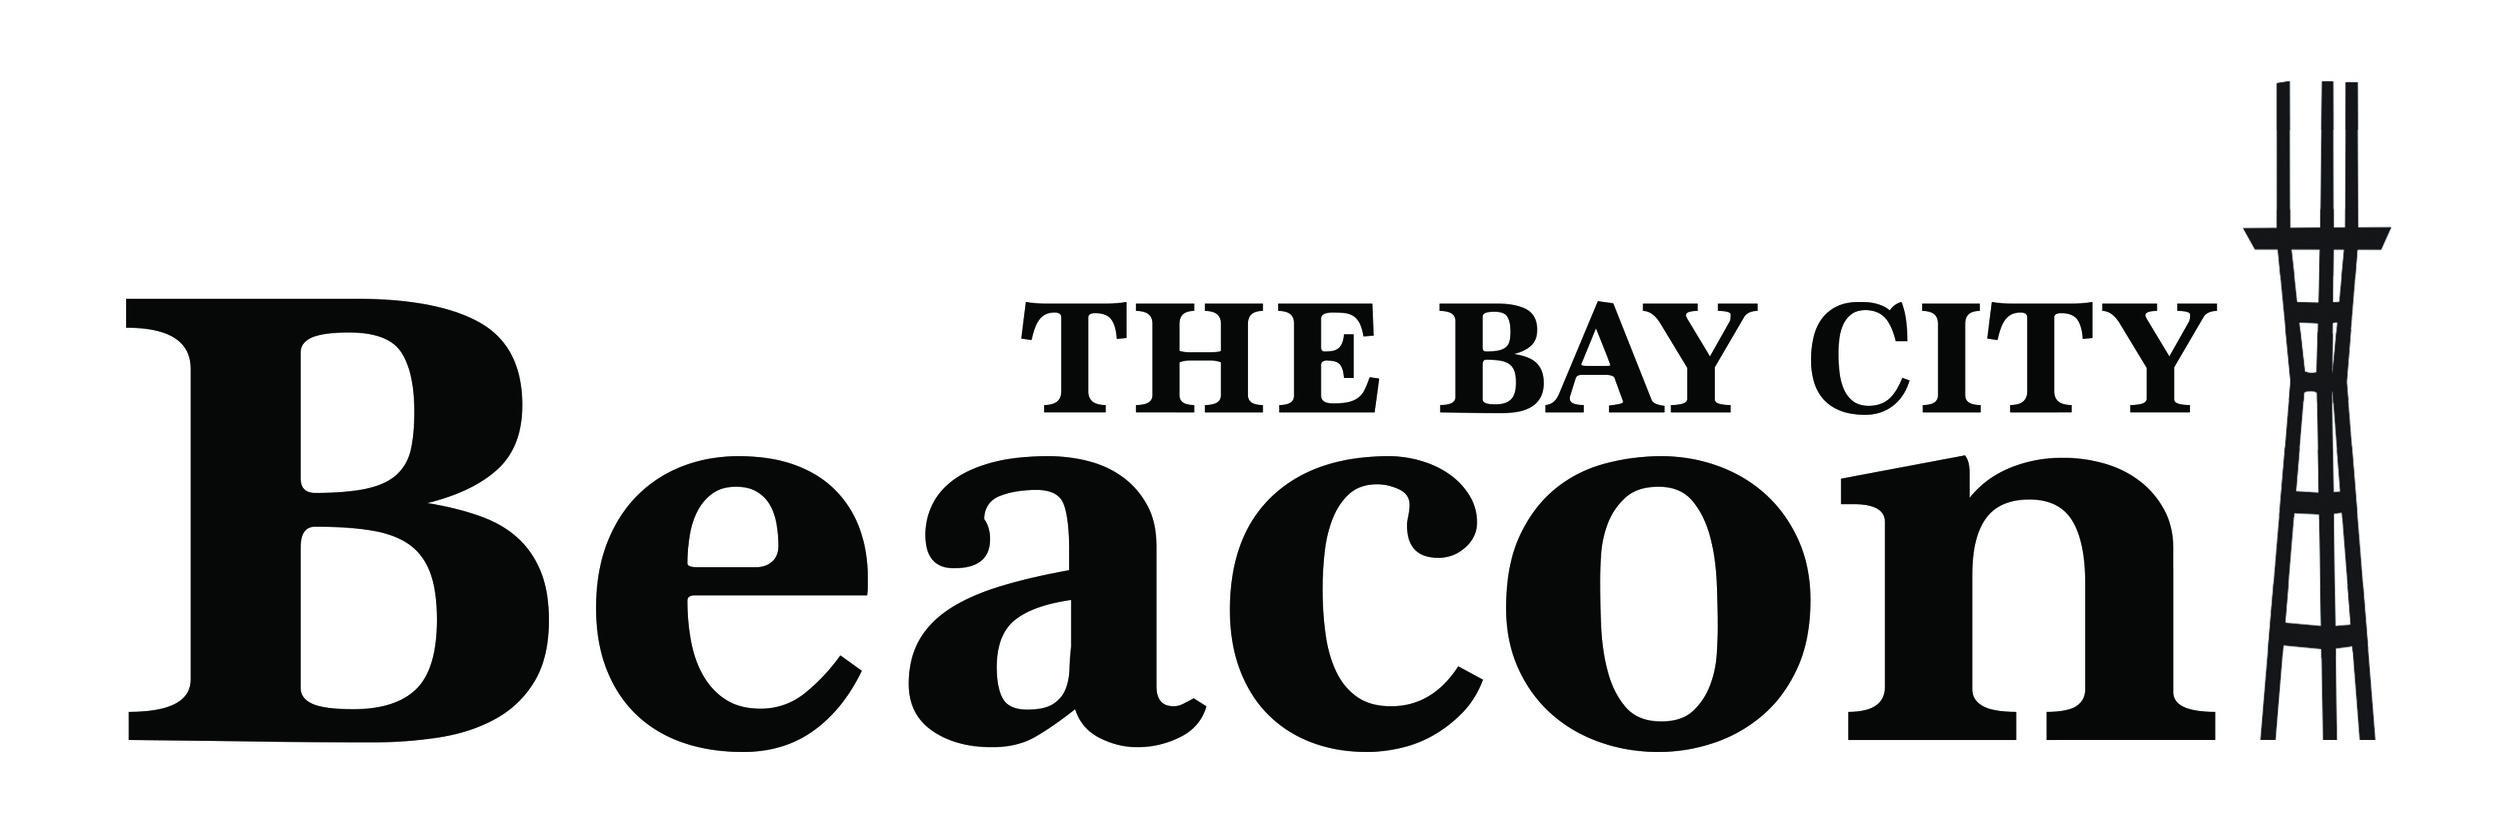 Next Week is SF Transit Week! | The Bay City Beacon | Sept 21, 2017